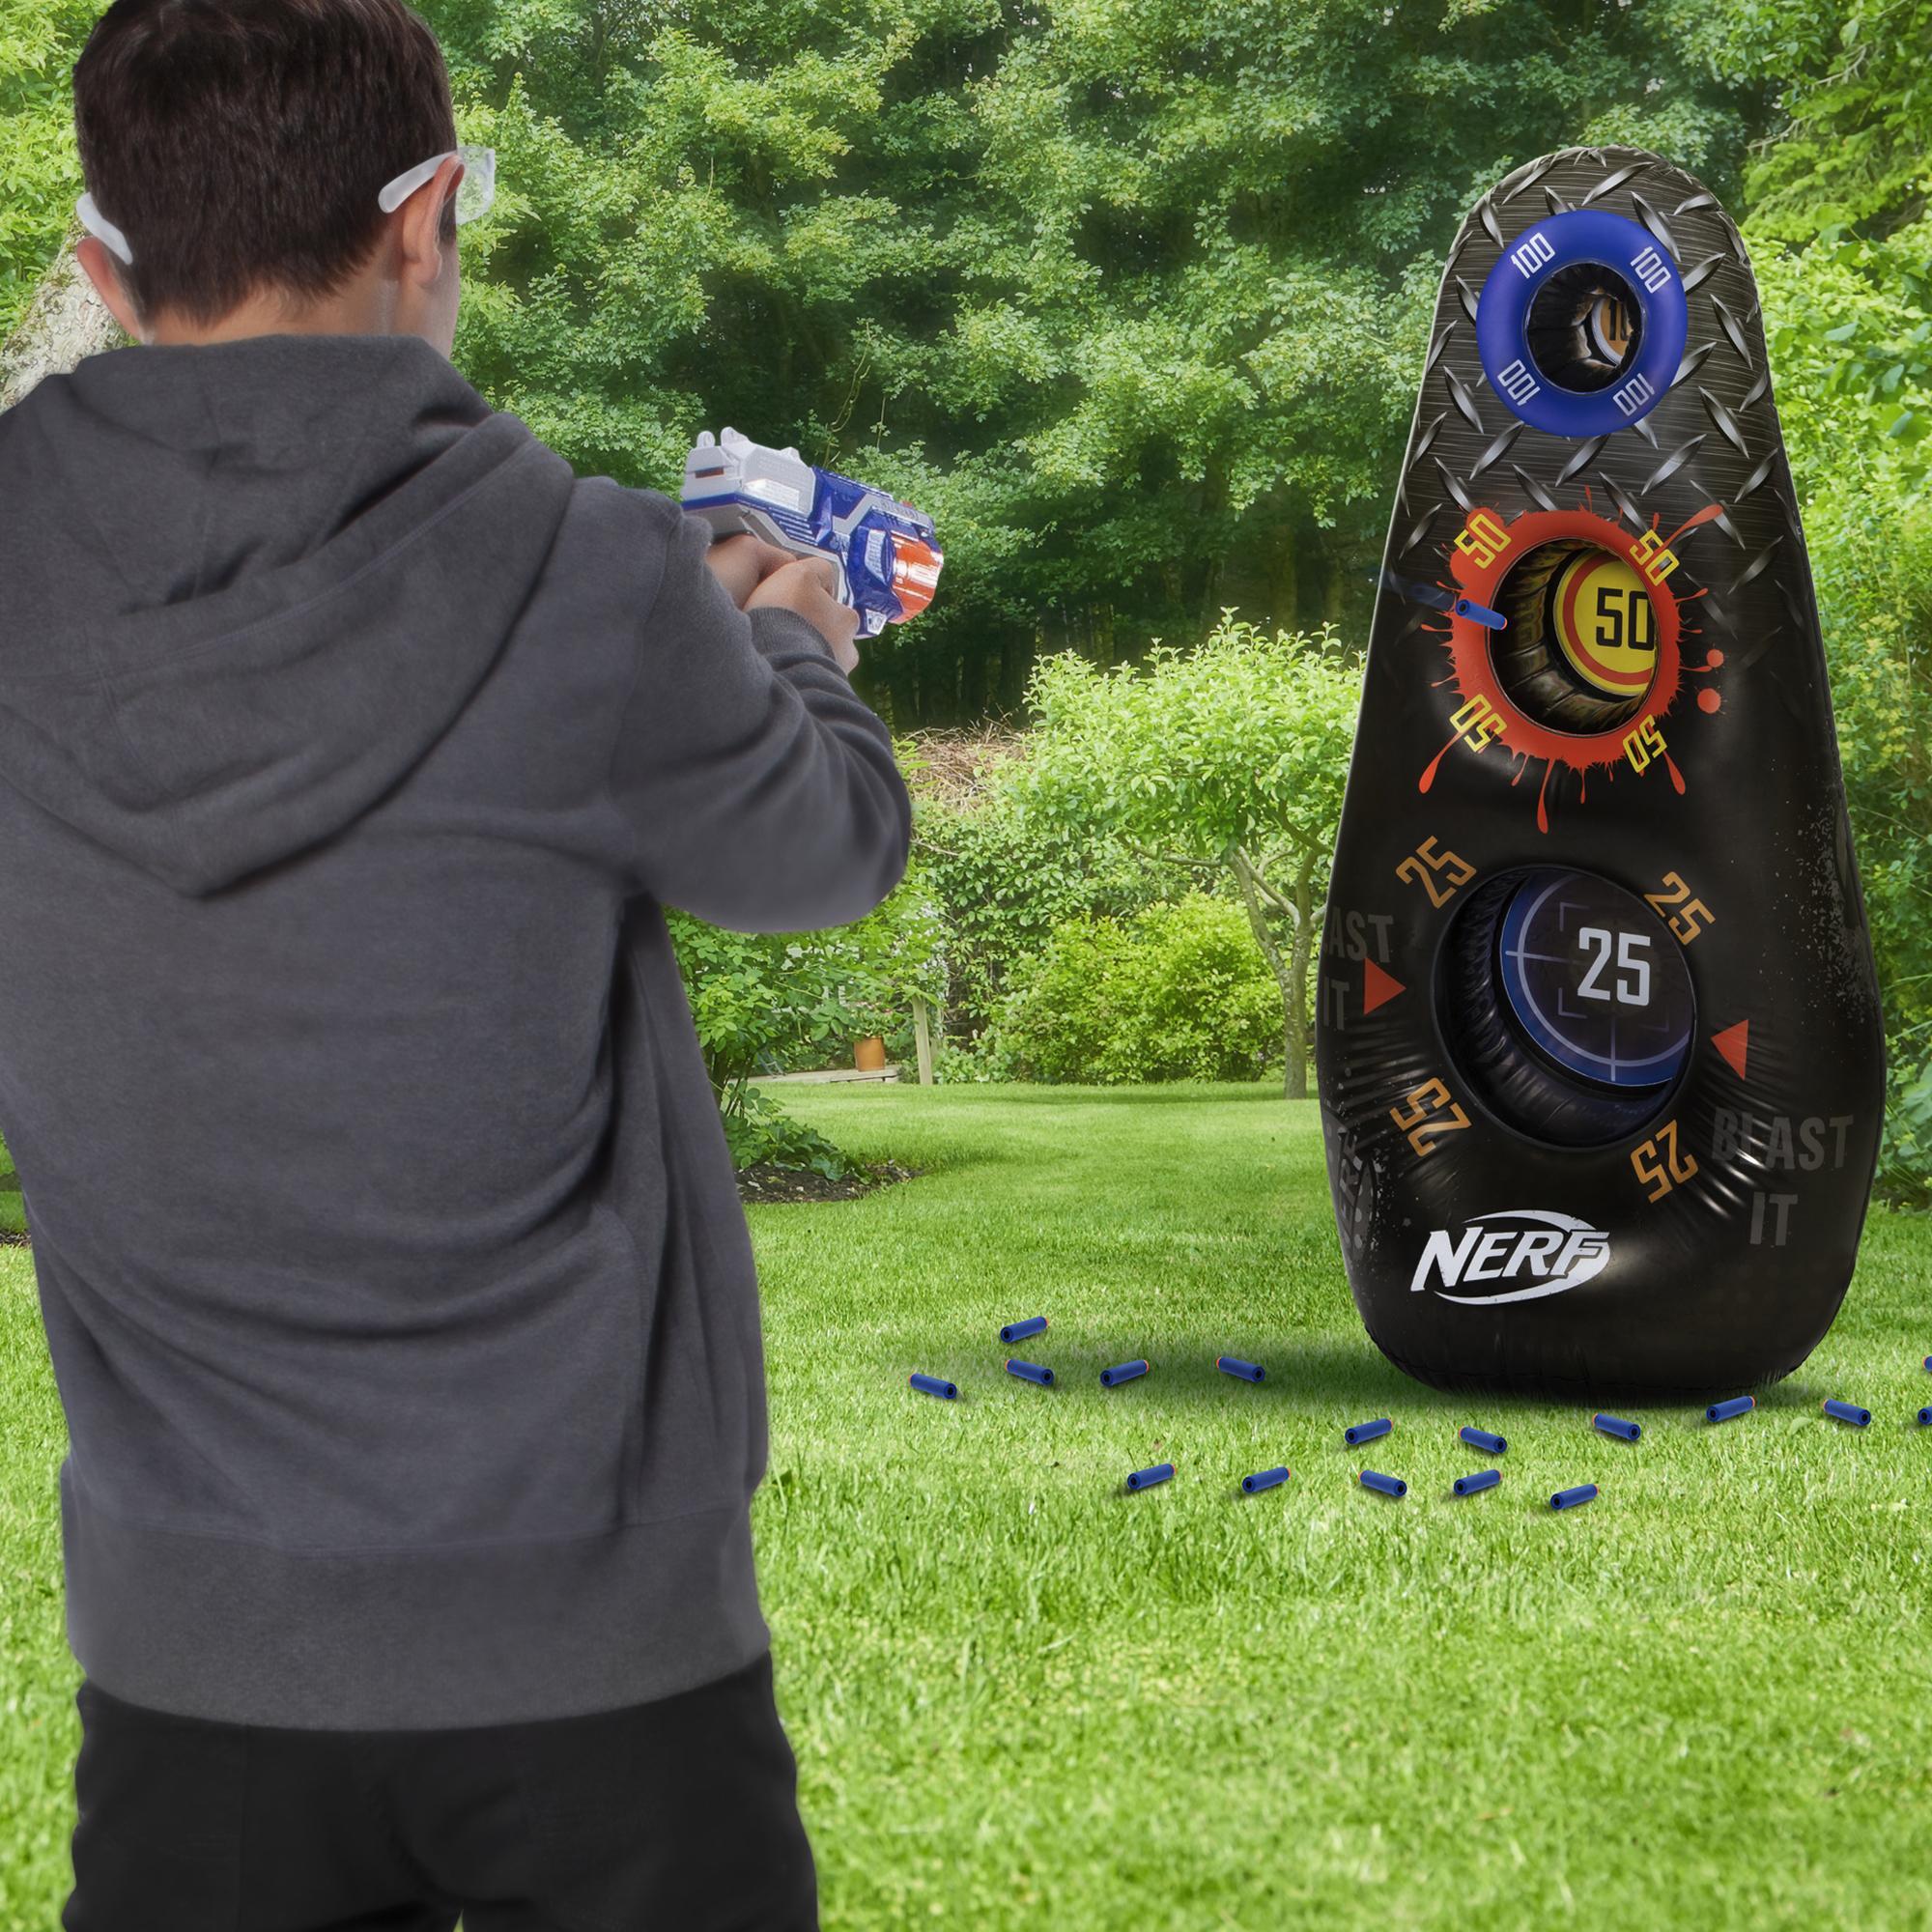 NERF Elite Inflatable Target